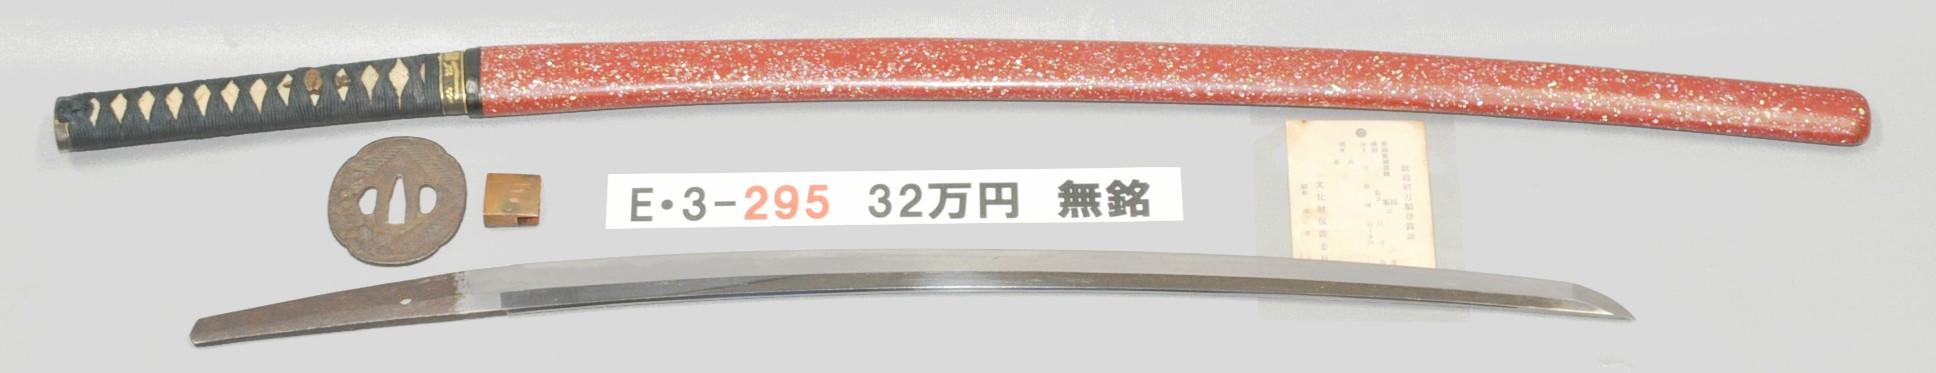 E3295